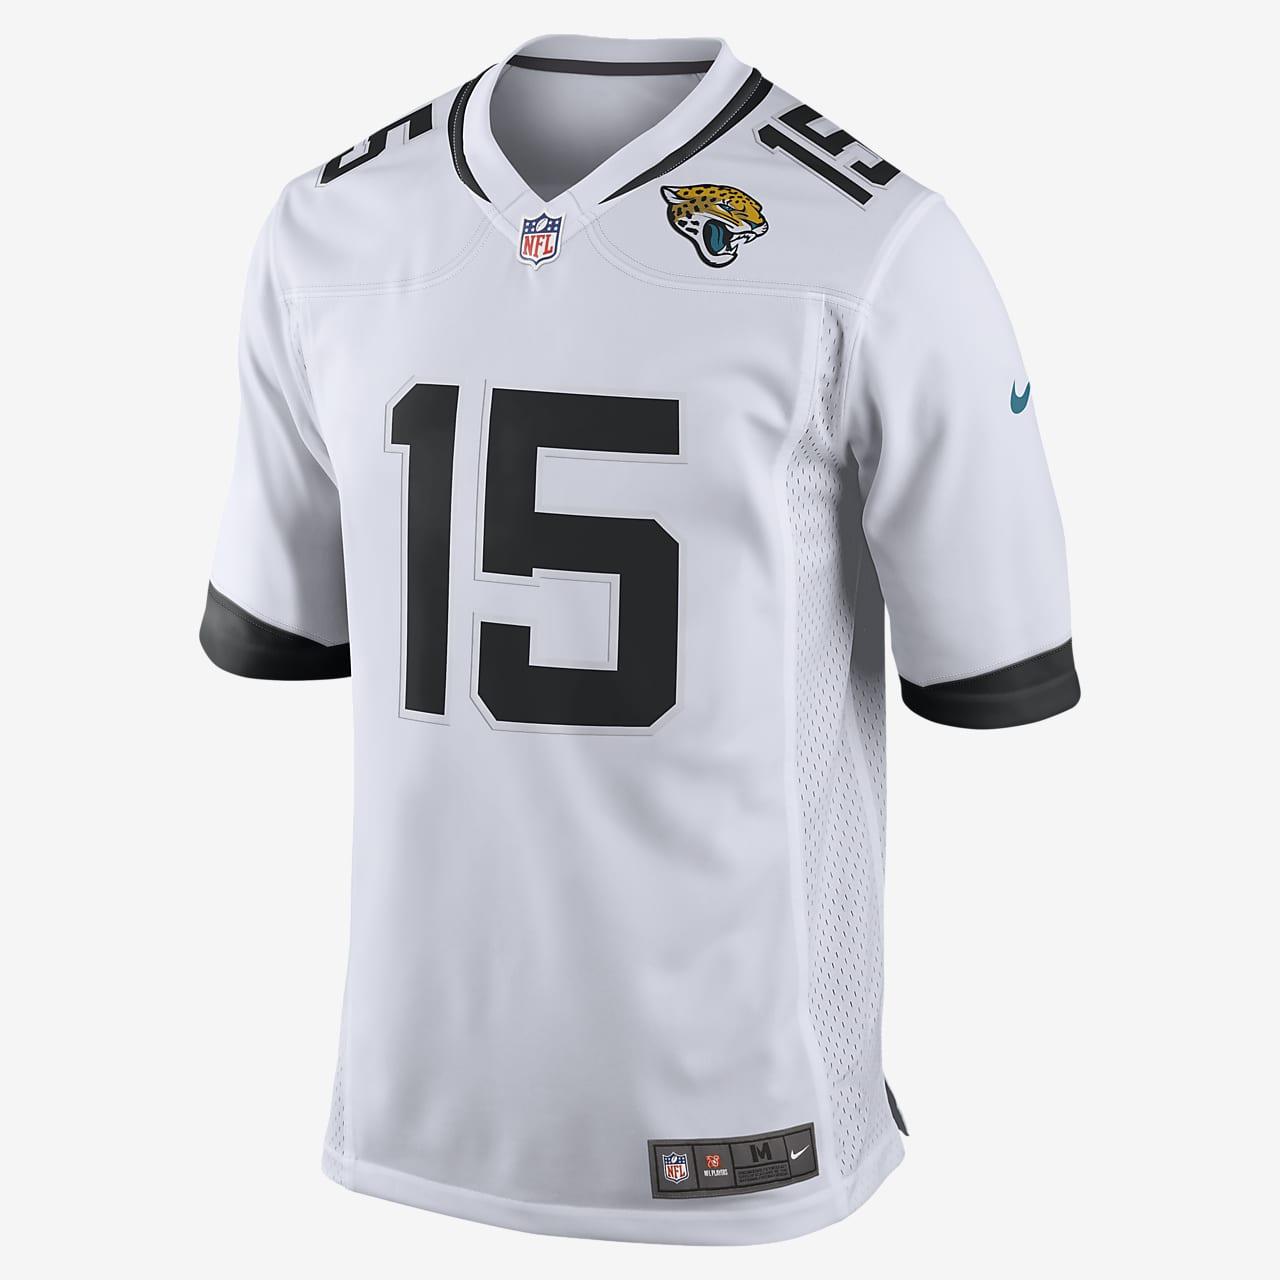 NFL Jacksonville Jaguars (Gardner Minshew) Men's Game Football Jersey